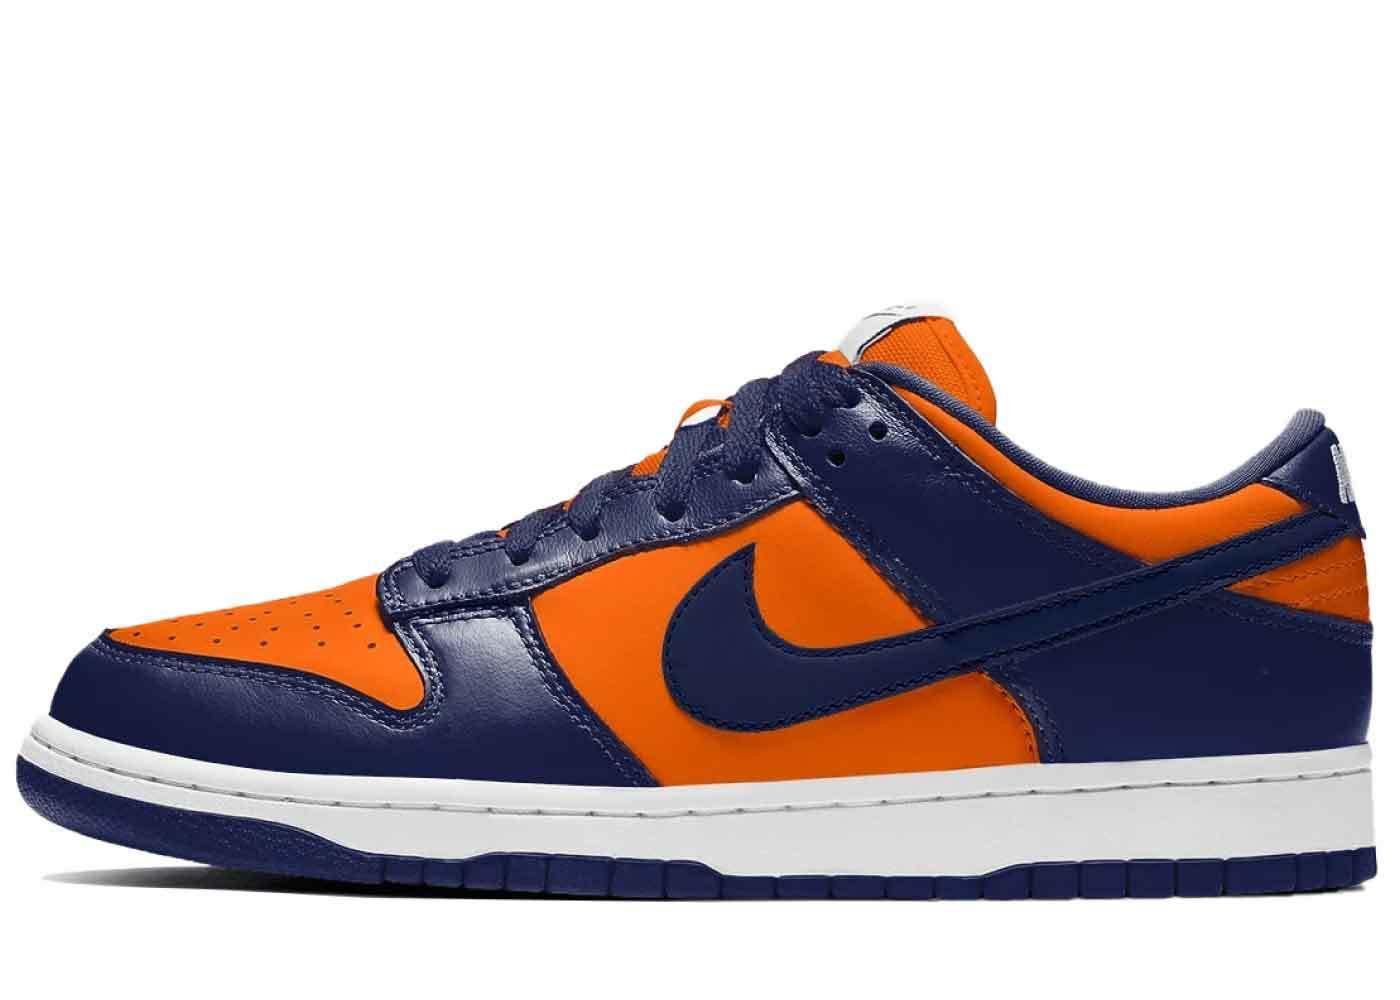 Nike Dunk Low Champ Colorsの写真